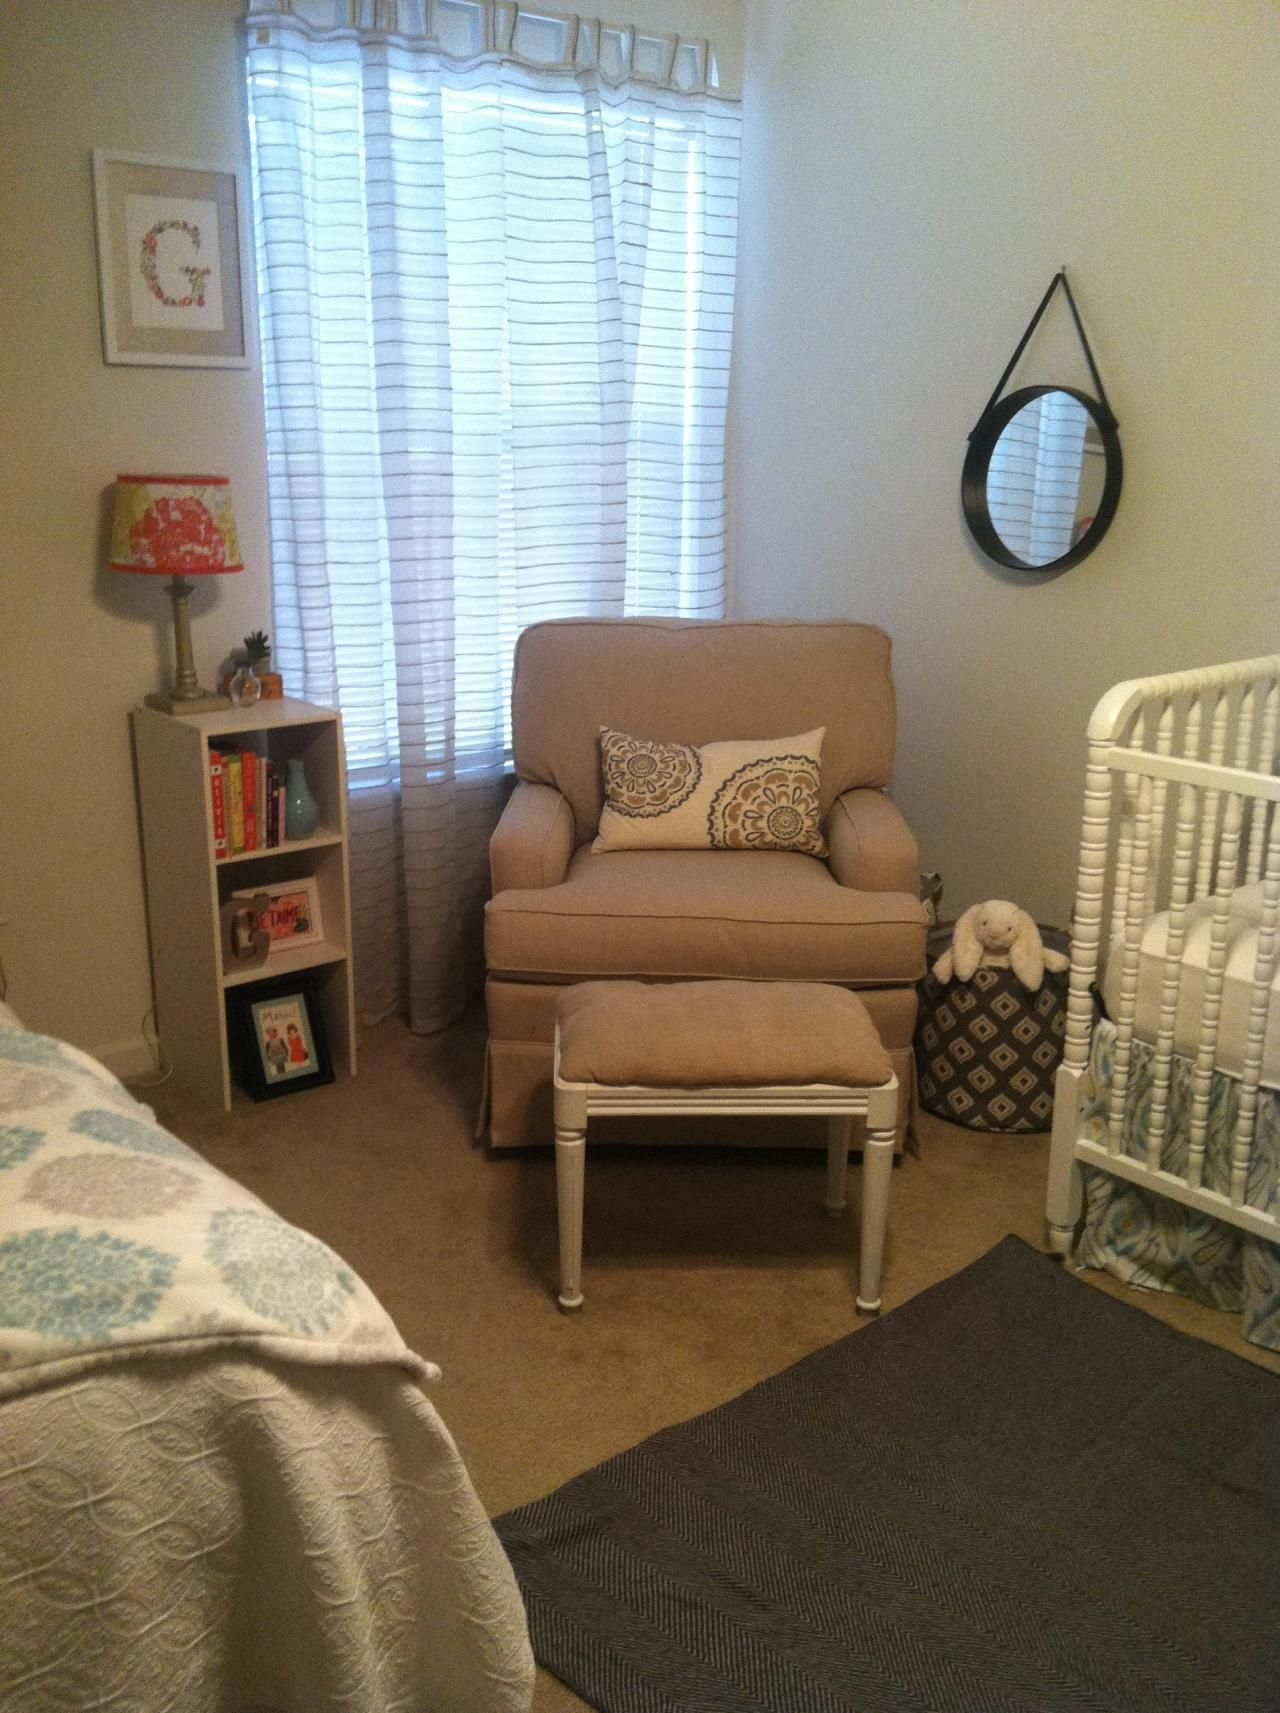 2013 In the Home Customer Orders Best Rena Swivel Chair